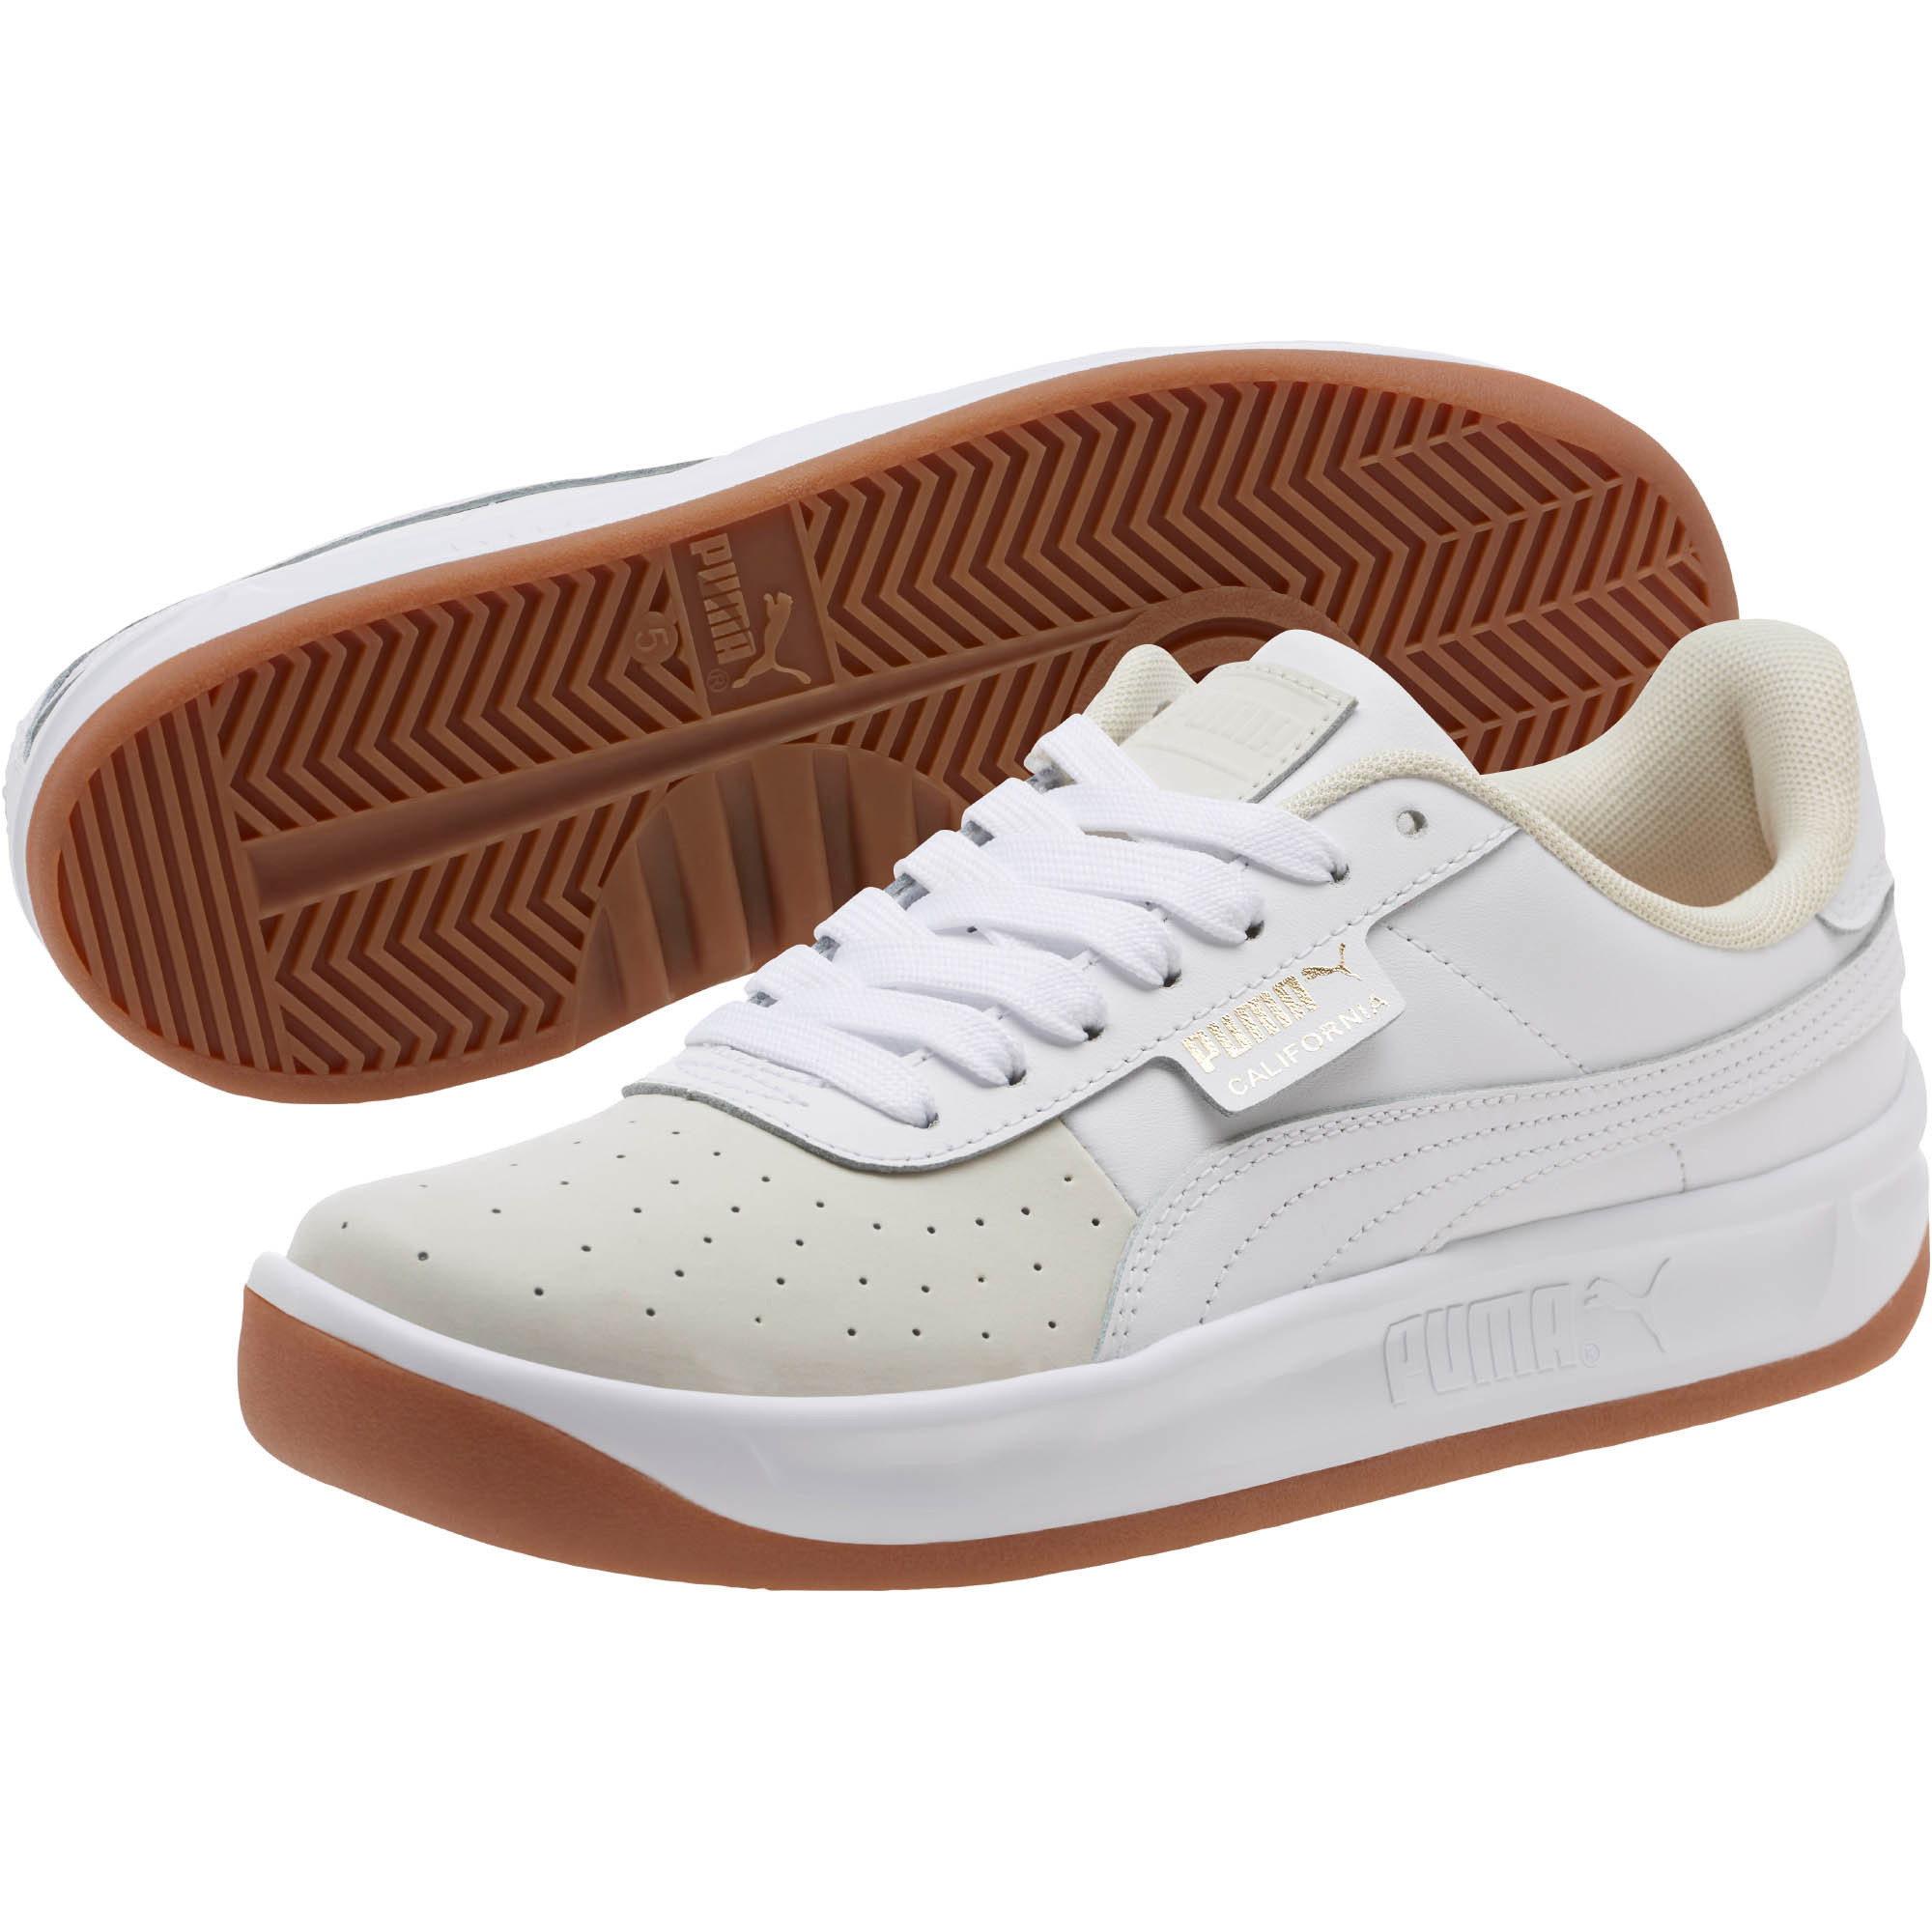 5a96824884 Details about PUMA California Exotic Women's Sneakers Women Shoe Sport  Classics